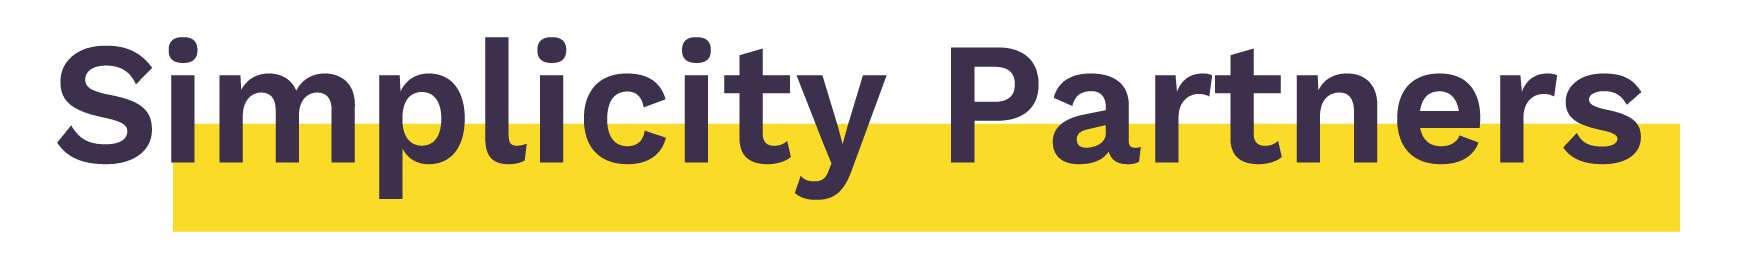 Simplicity Partners logo